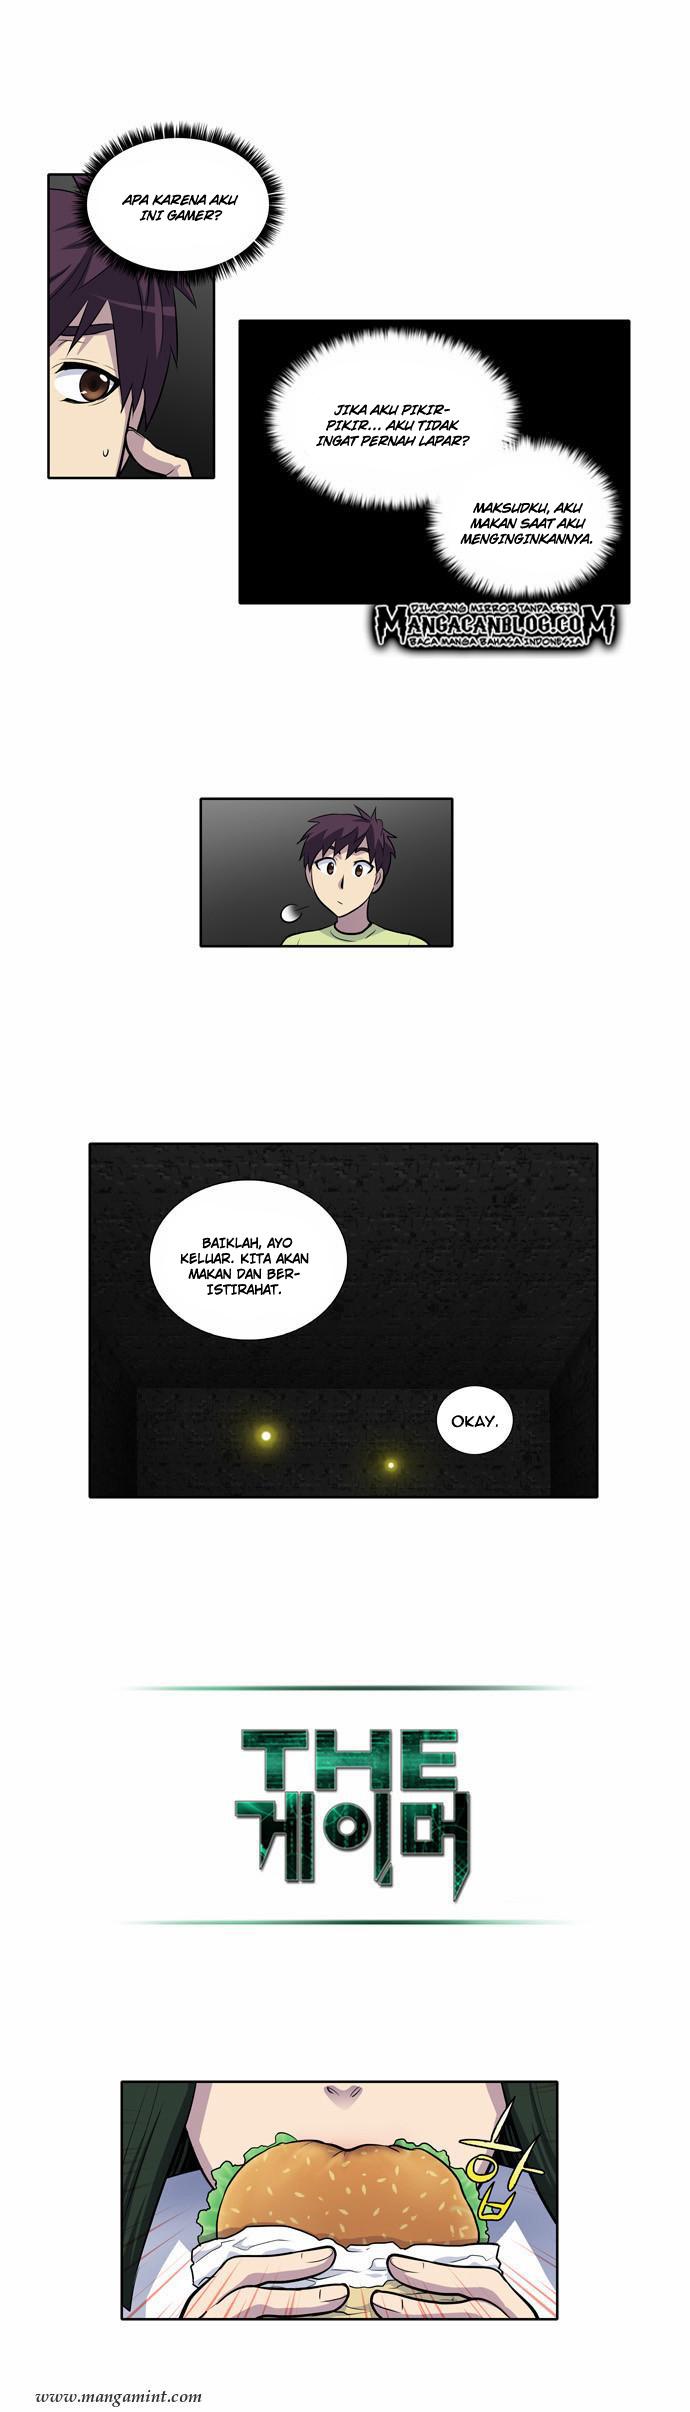 Dilarang COPAS - situs resmi www.mangacanblog.com - Komik the gamer 111 - bagaimana kau tidur dengan level itu? 112 Indonesia the gamer 111 - bagaimana kau tidur dengan level itu? Terbaru 5|Baca Manga Komik Indonesia|Mangacan